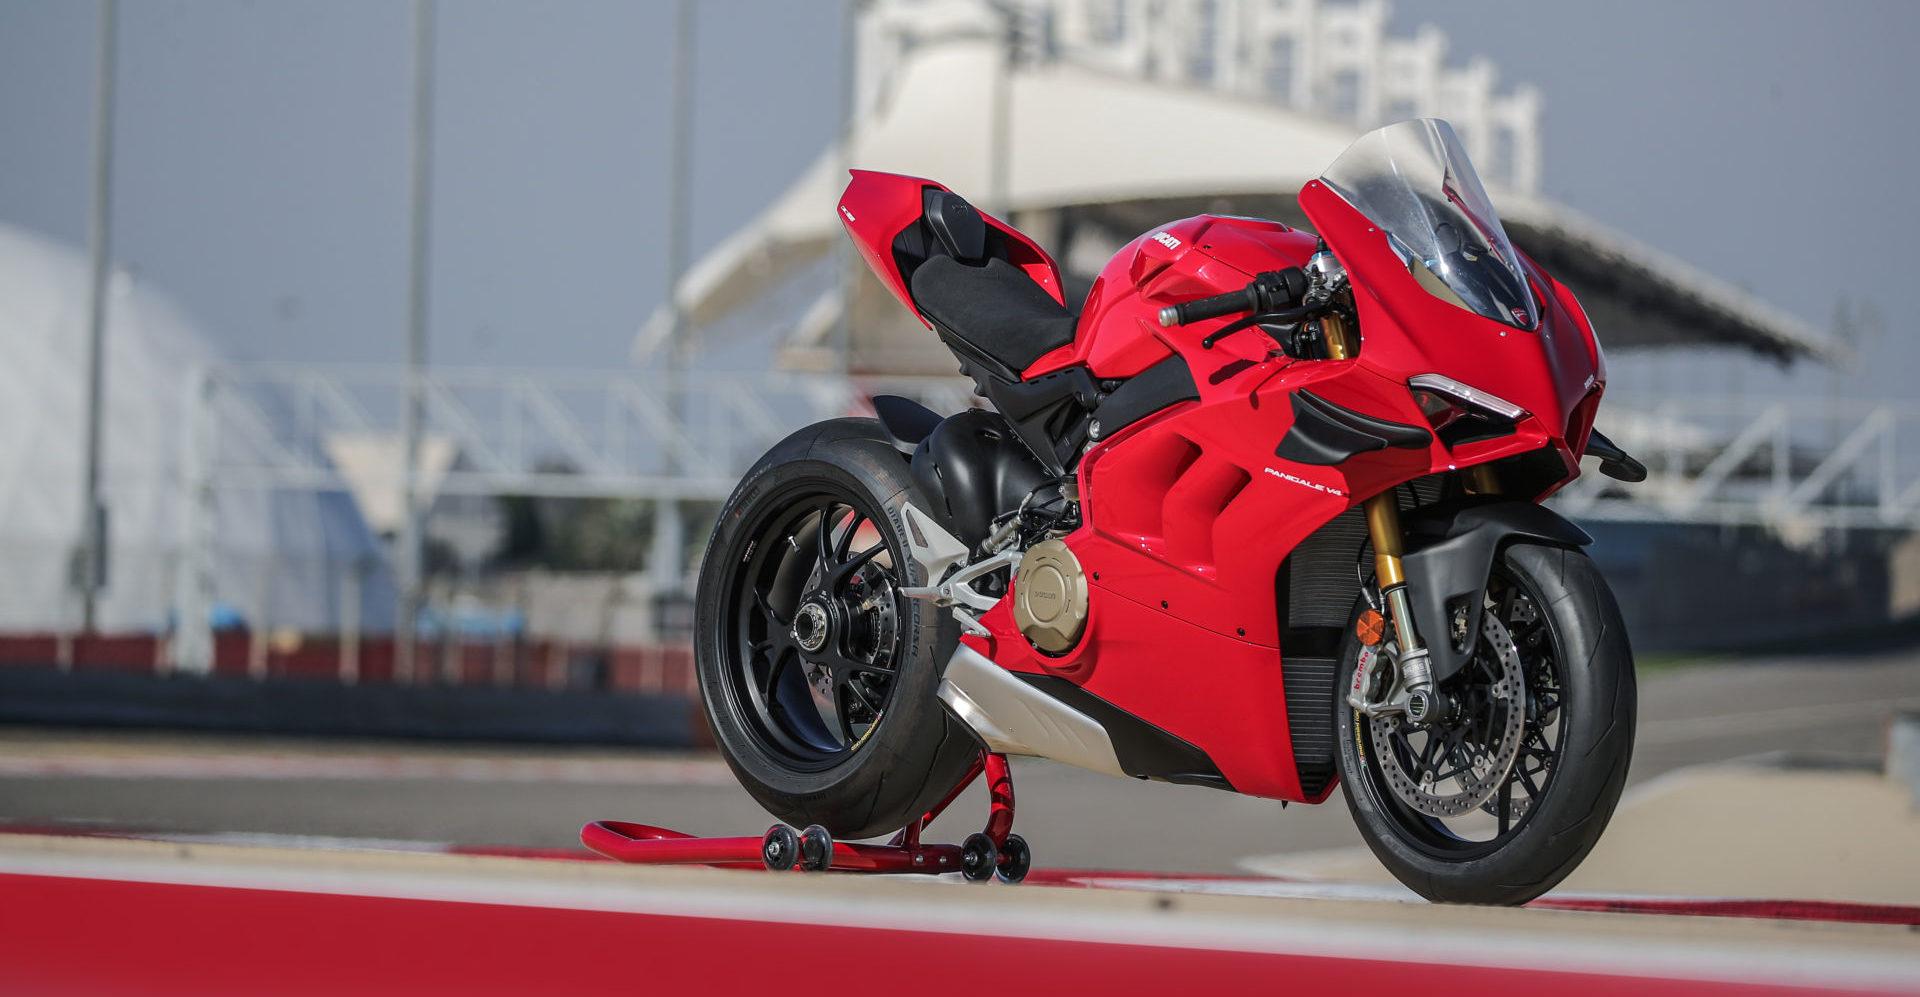 A 2020-model Ducati Panigale V4 S. Photo courtesy of Ducati.